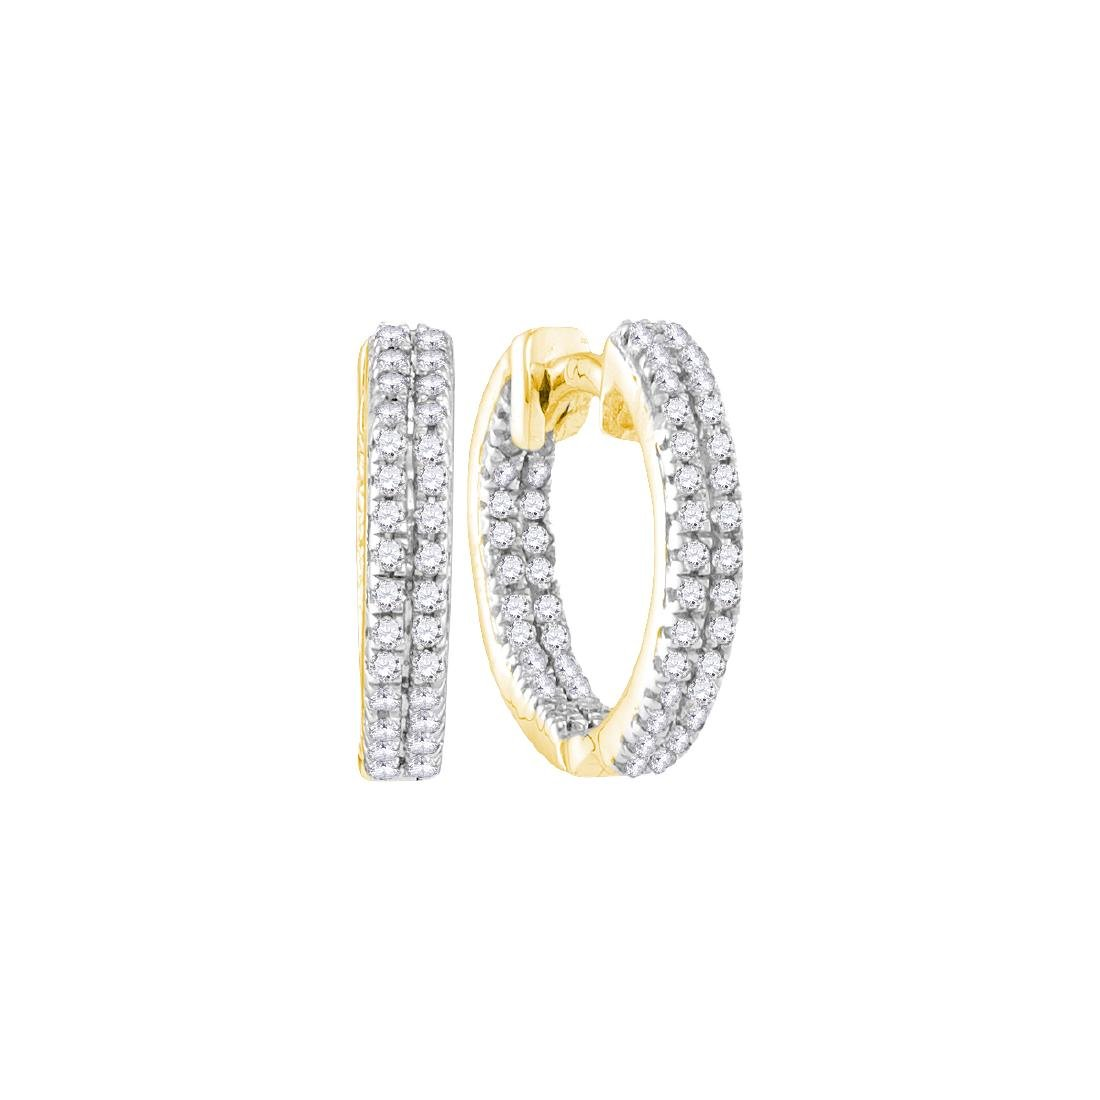 0.20 CTW Diamond Hoop Earrings 10KT Yellow Gold -